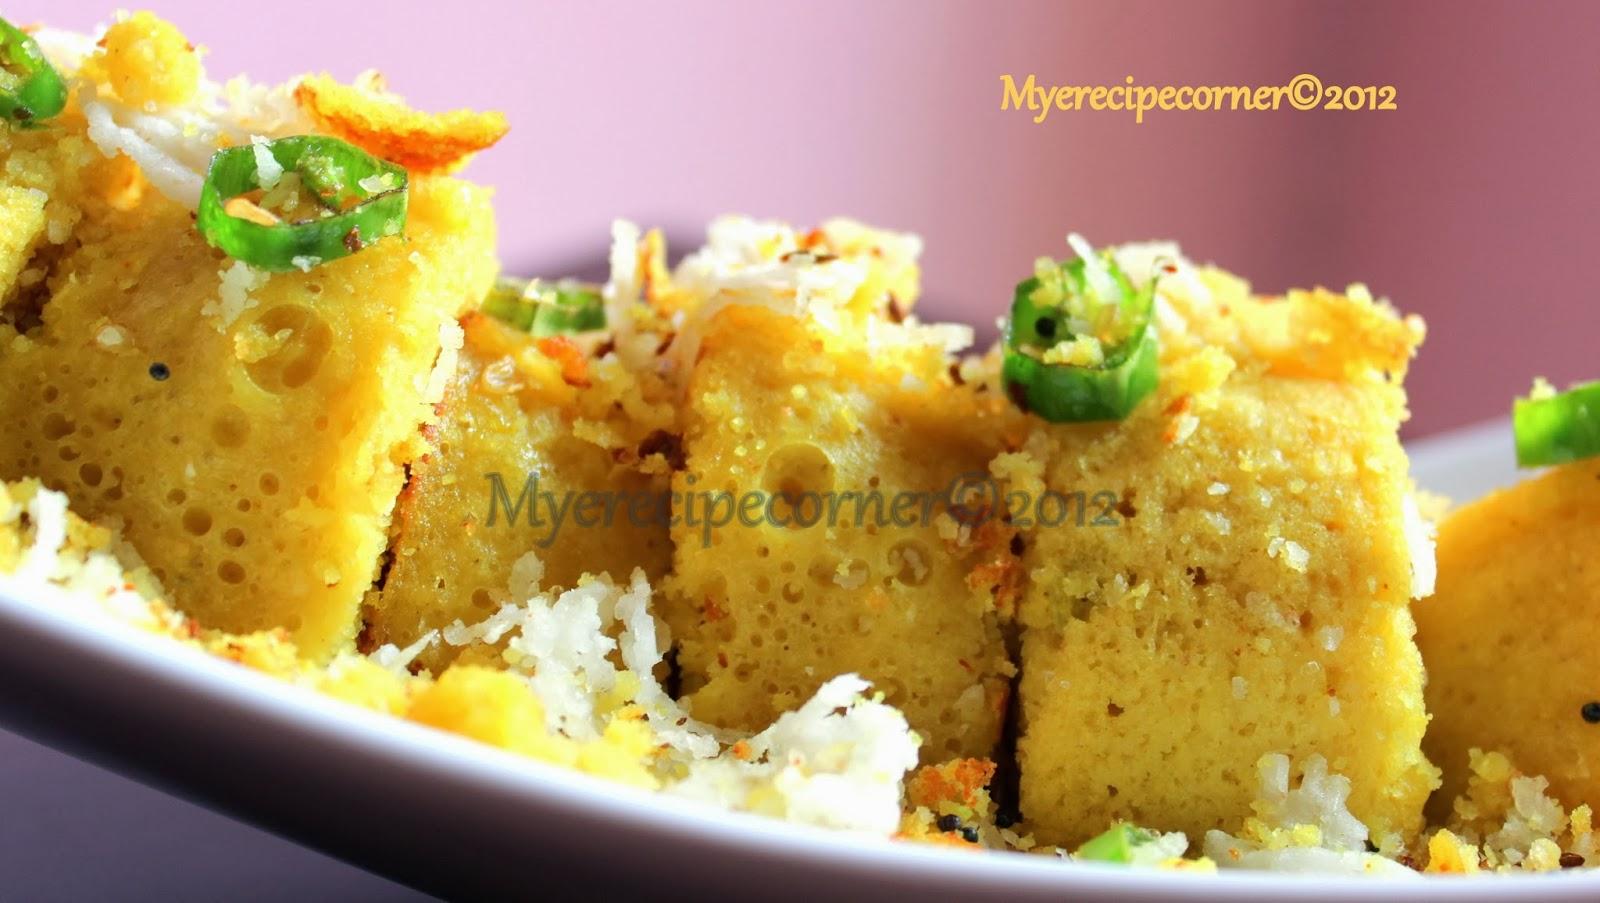 Myes kitchen khaman dhokla recipe a tribute to tarla dalal khaman dhokla recipe forumfinder Image collections